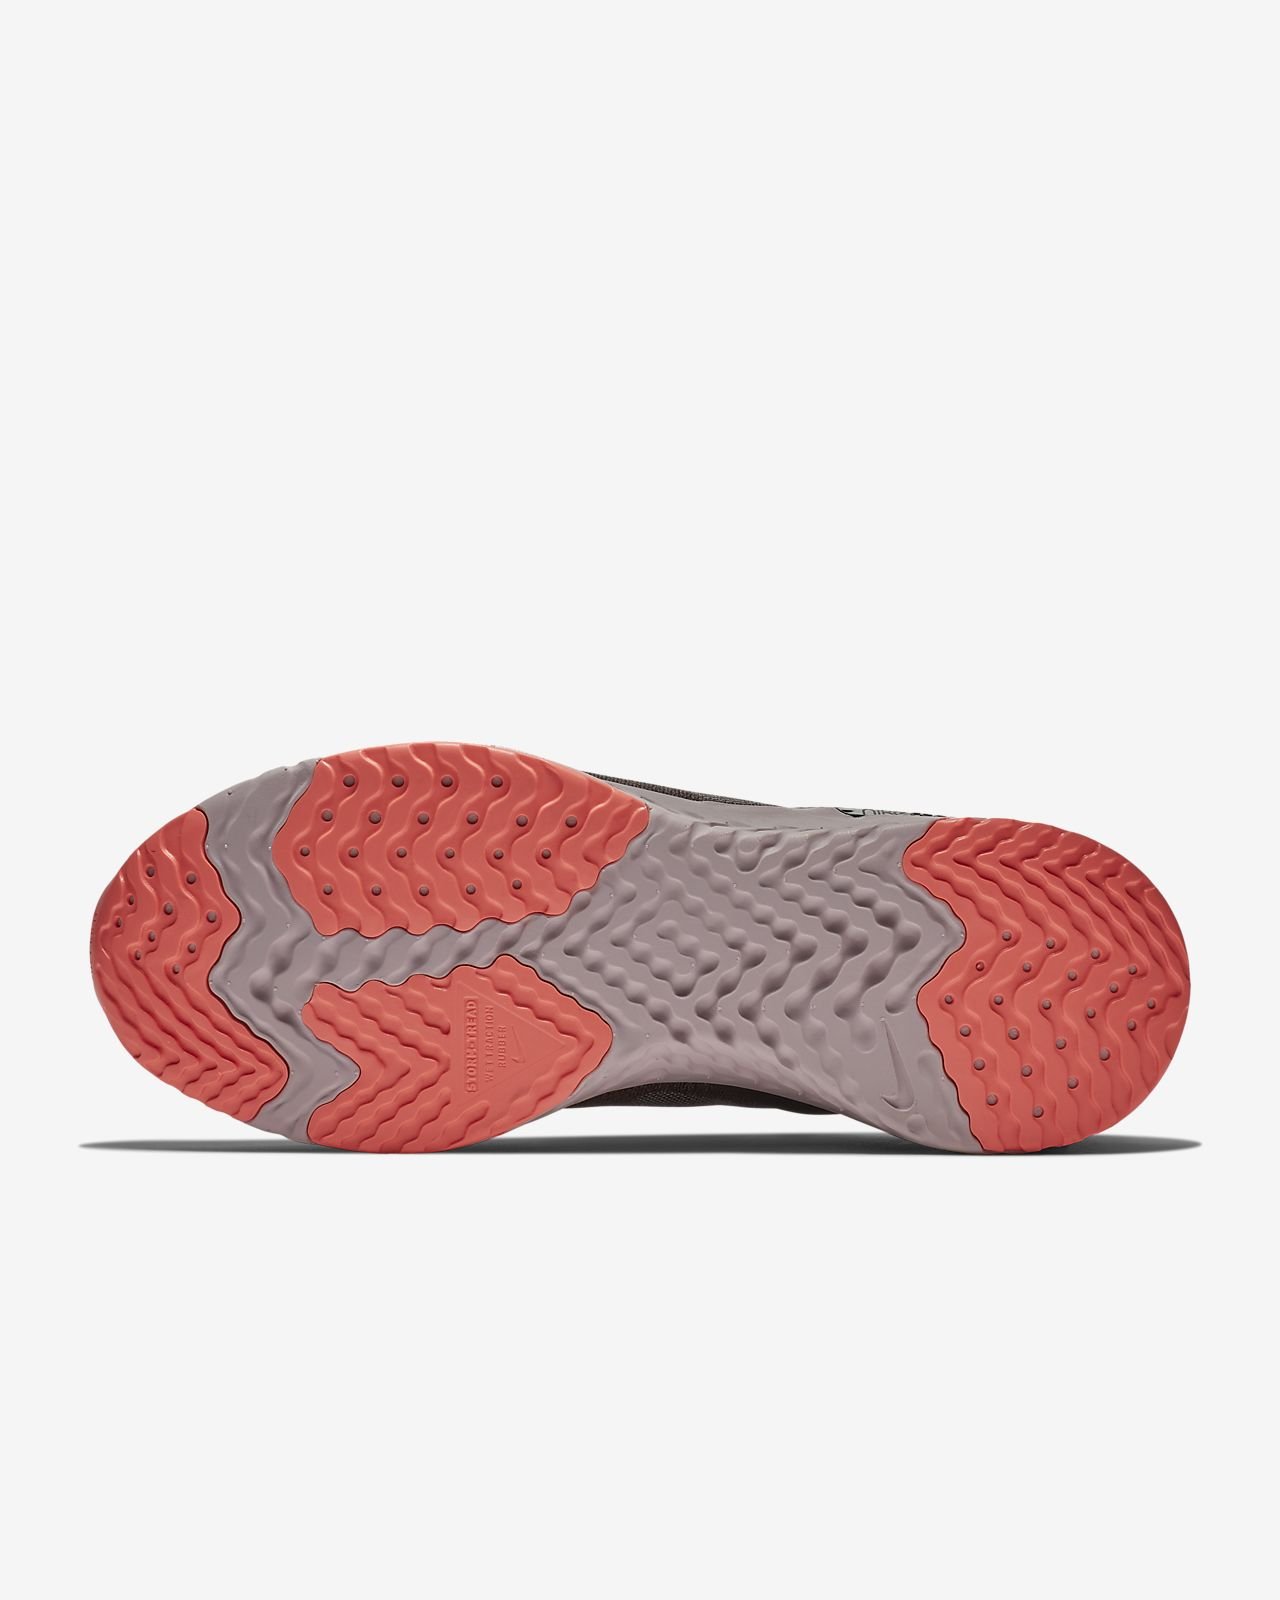 Nike Odyssey React Shield Water-Repellent Women s Running Shoe. Nike ... 21fa2268c